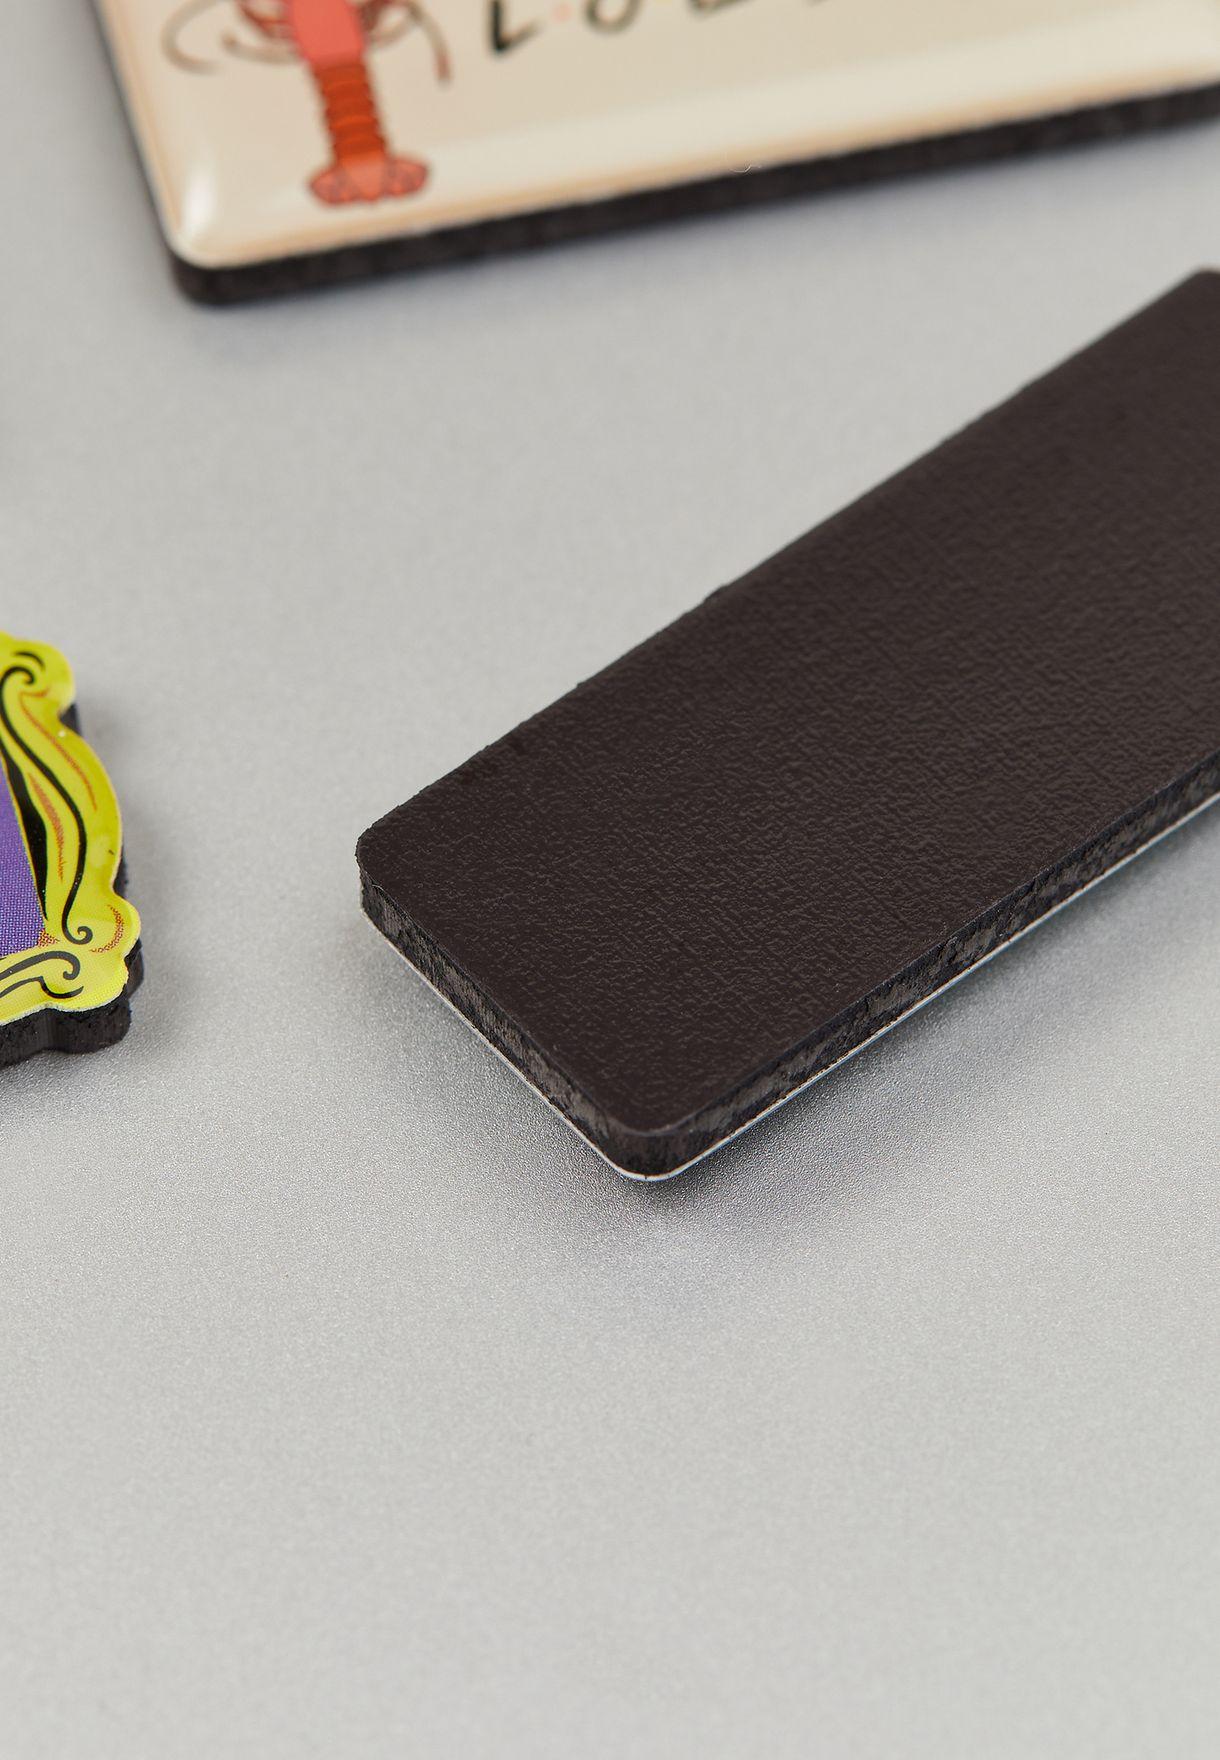 Set Of 5 Friends Magnets